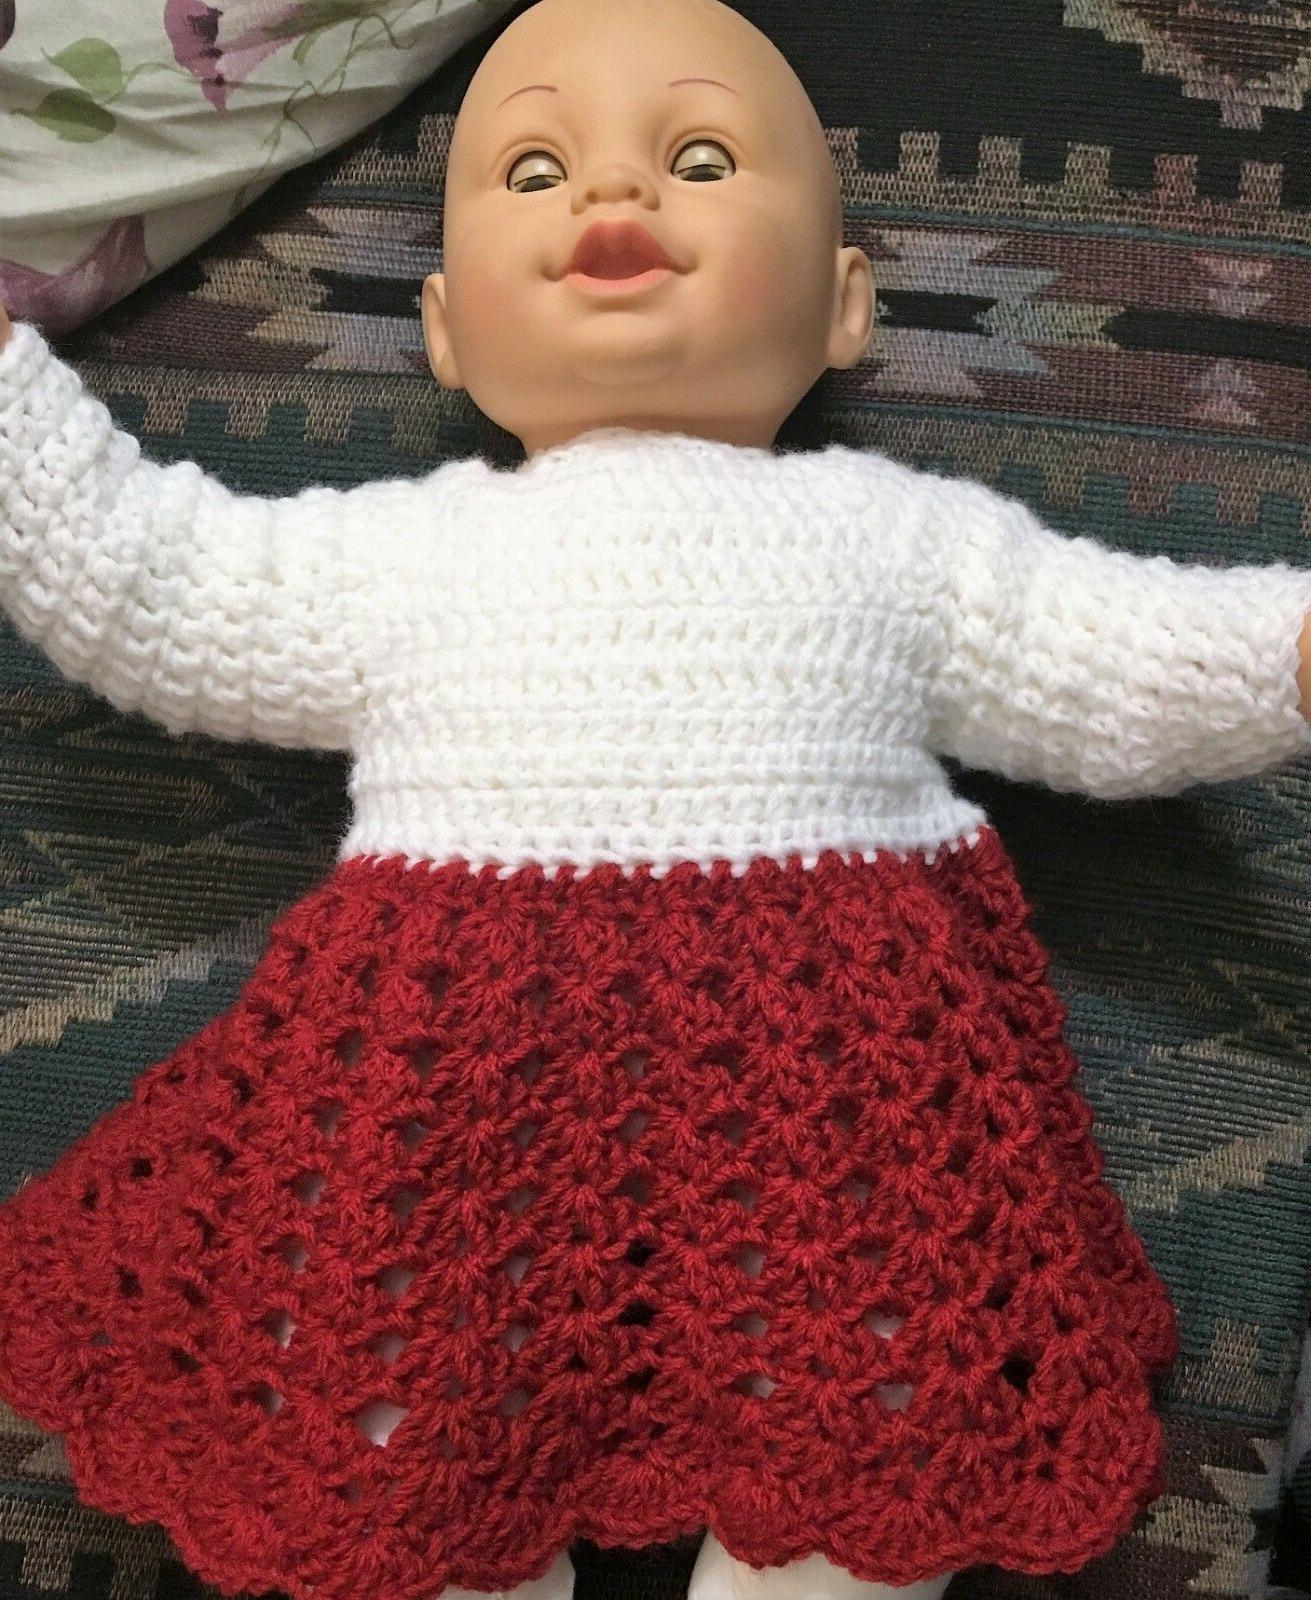 Acrylic Handmade Crochet L/S Dress PREEMIE lbs. or Doll, Red/White